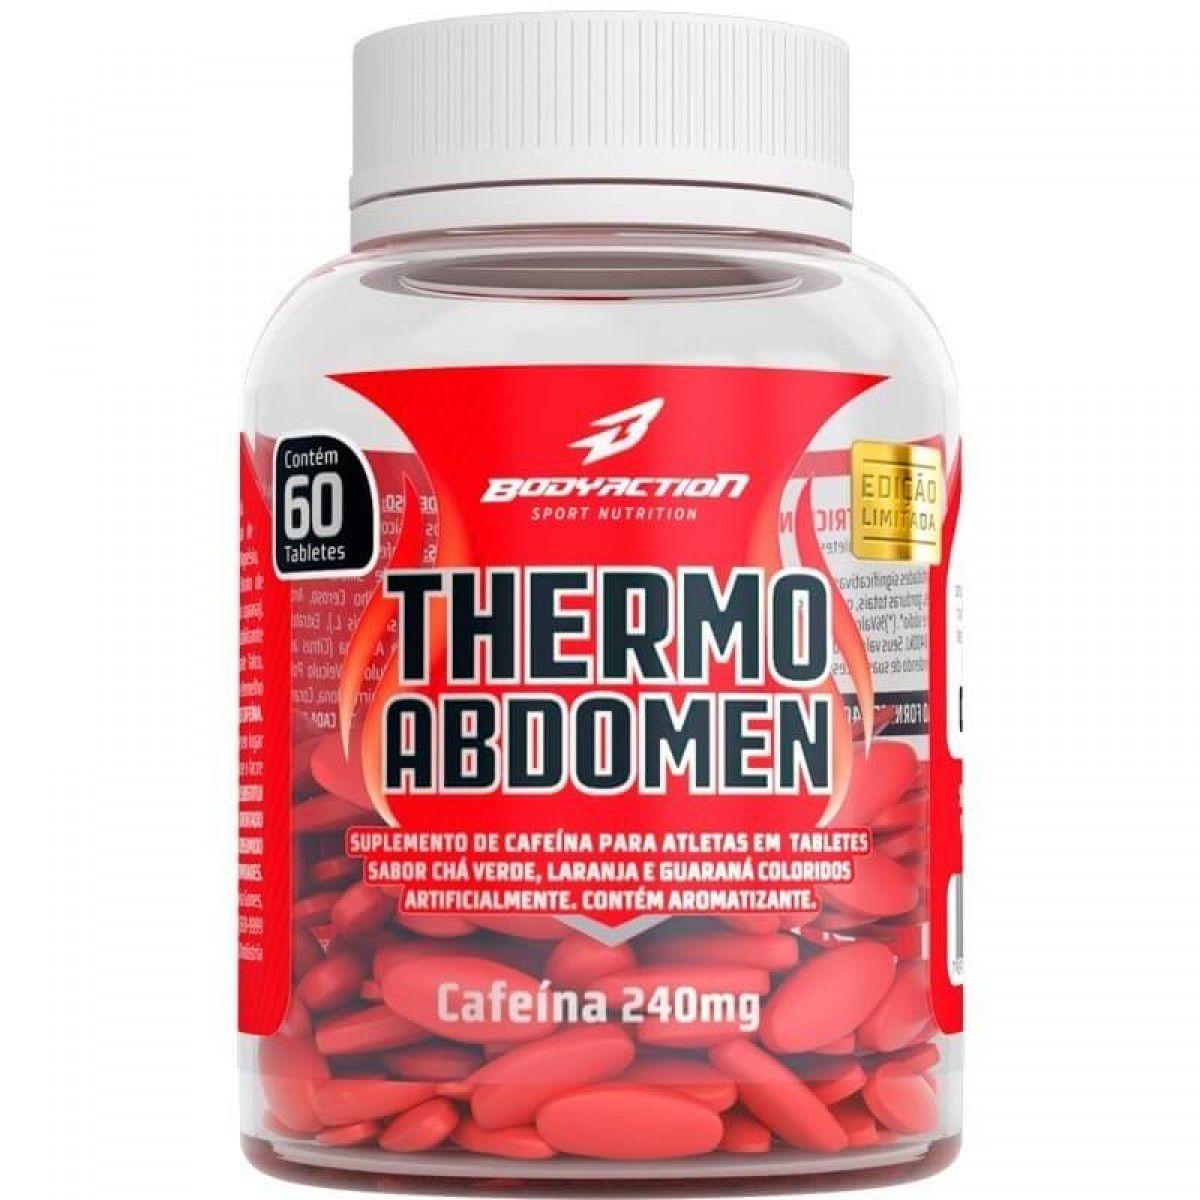 THERMO ABDOMEN 60 TABS - BODY ACTION